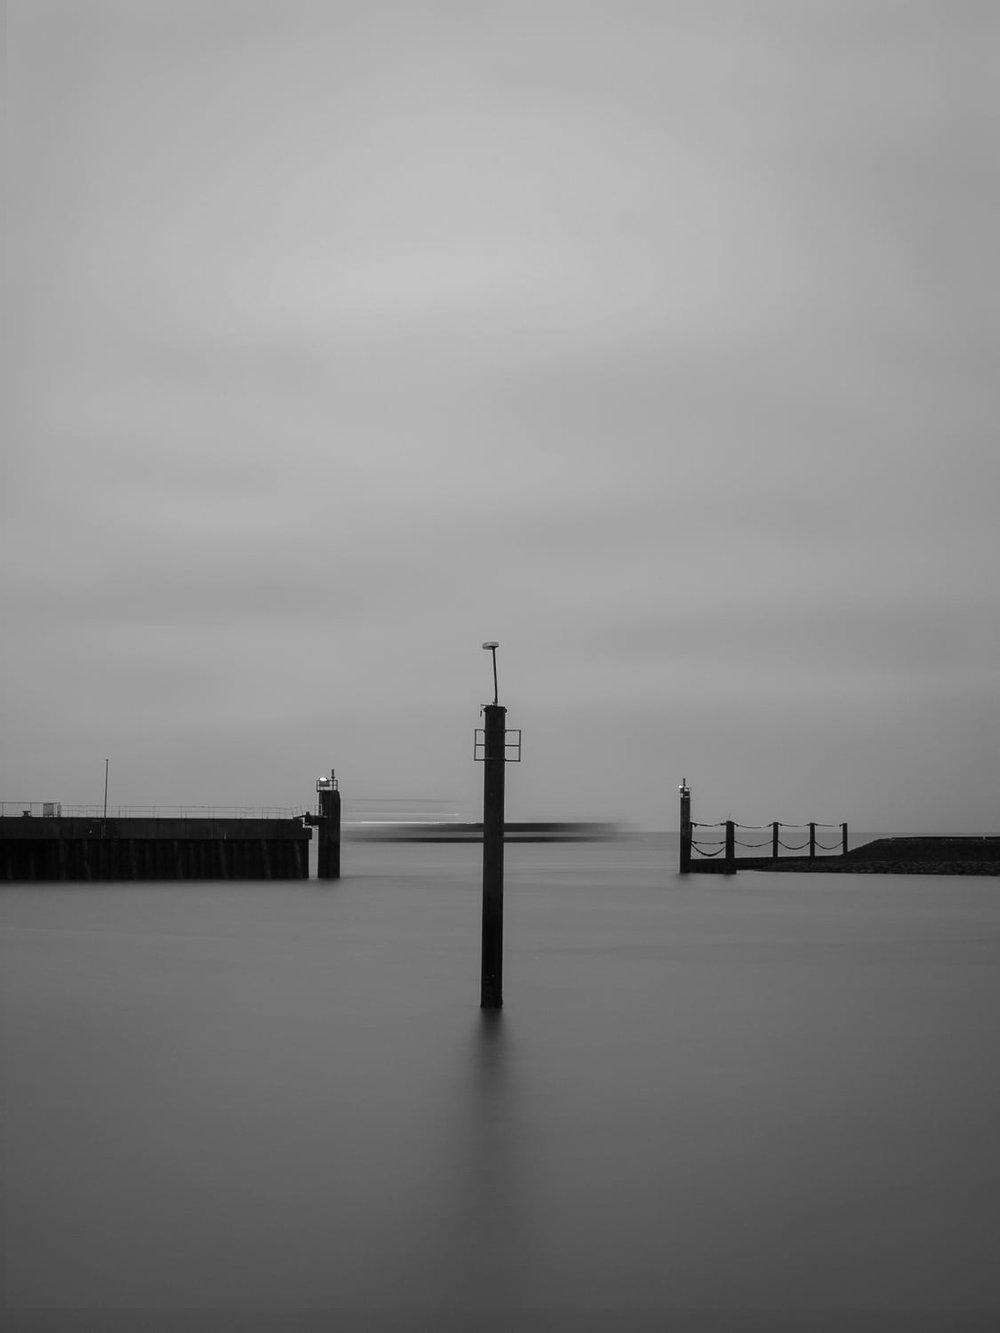 170225-Cuxhaven-P2258740-2-2.jpg